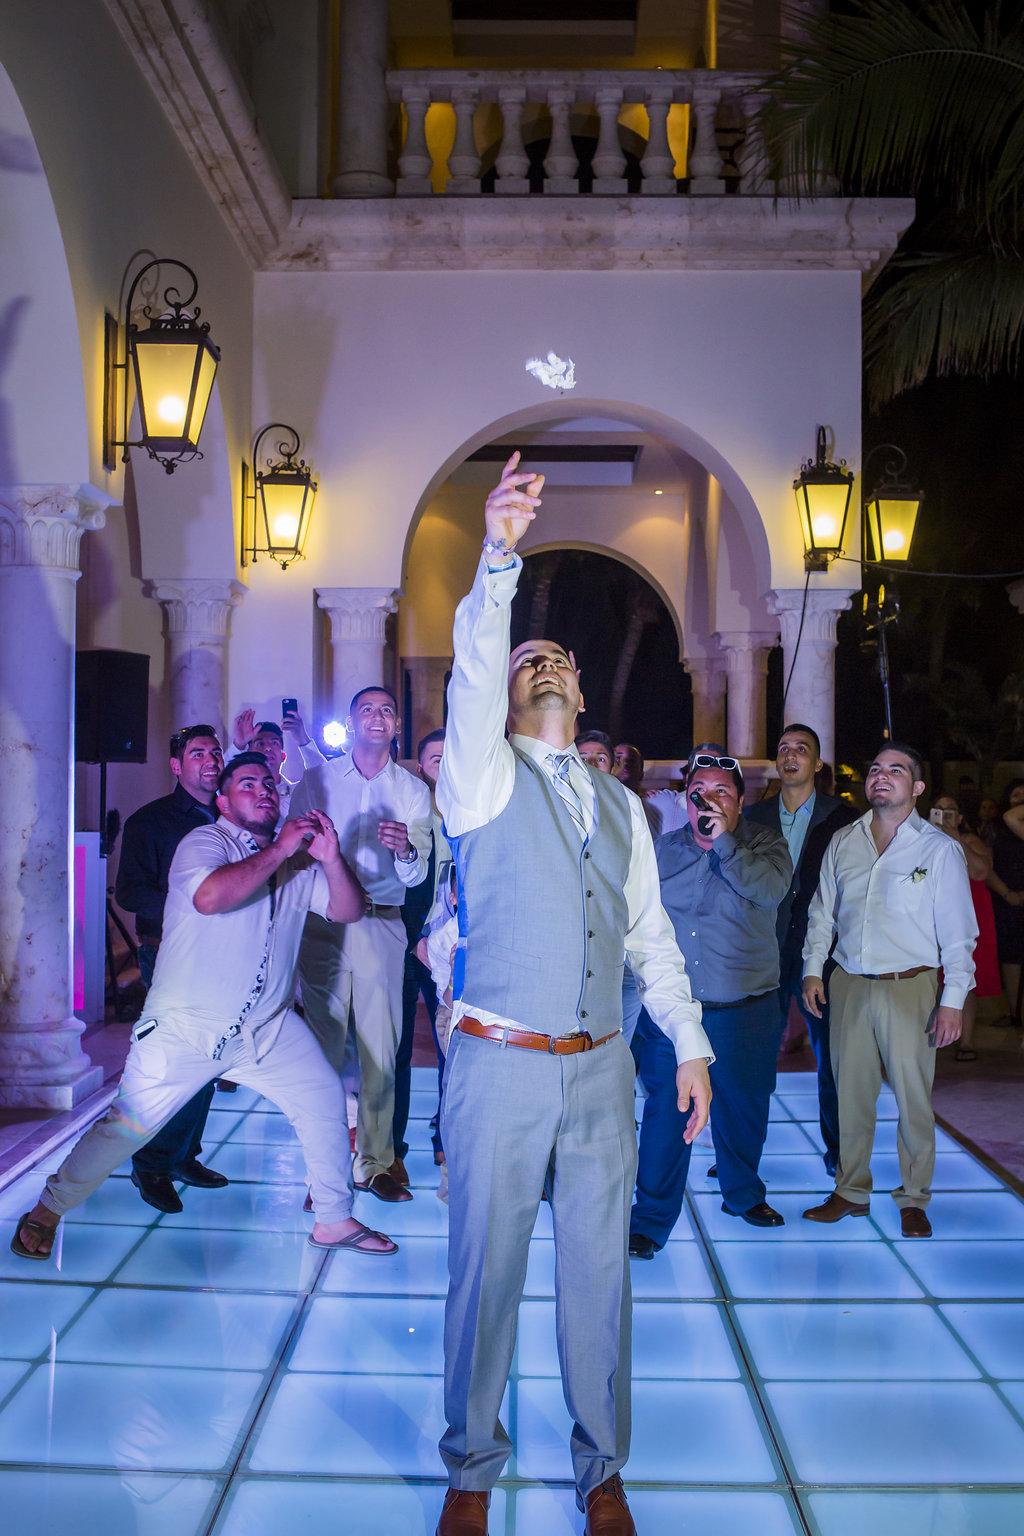 yesica-jose-beach-wedding-Villa-La-Joya--Playa-del-carmen-01--44.jpg